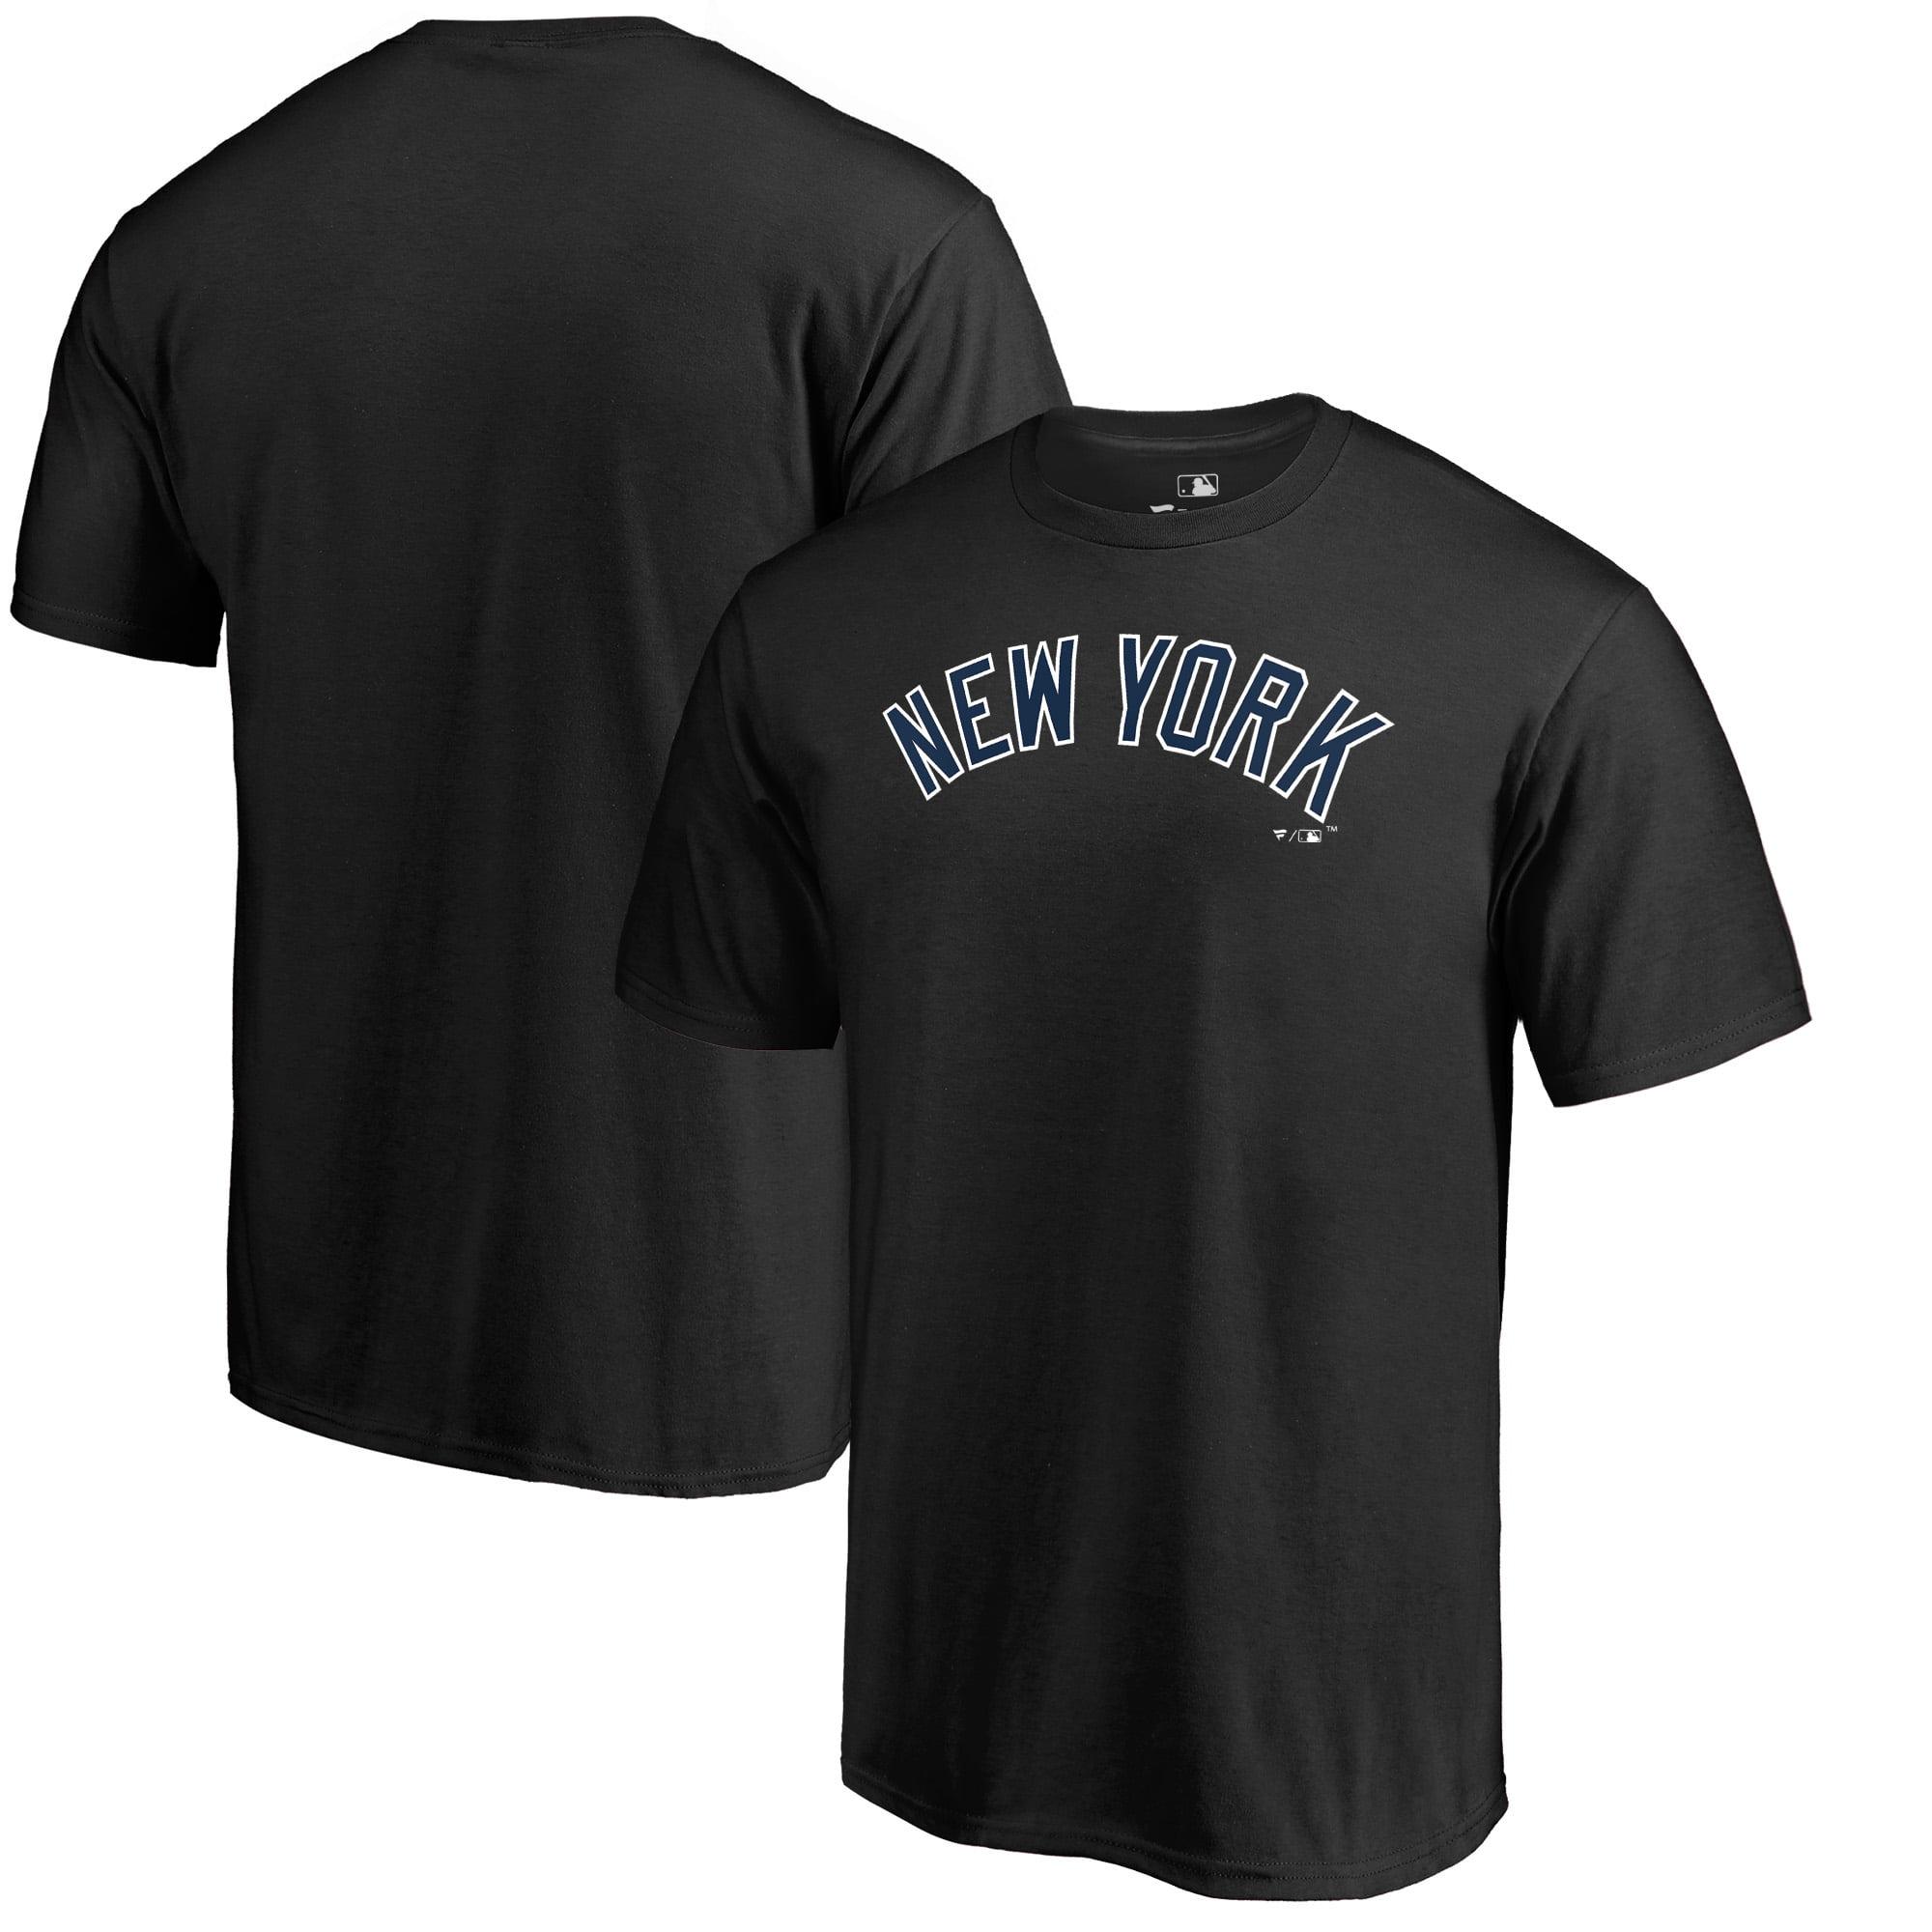 New York Yankees Fanatics Branded Team Wordmark T-Shirt - Black